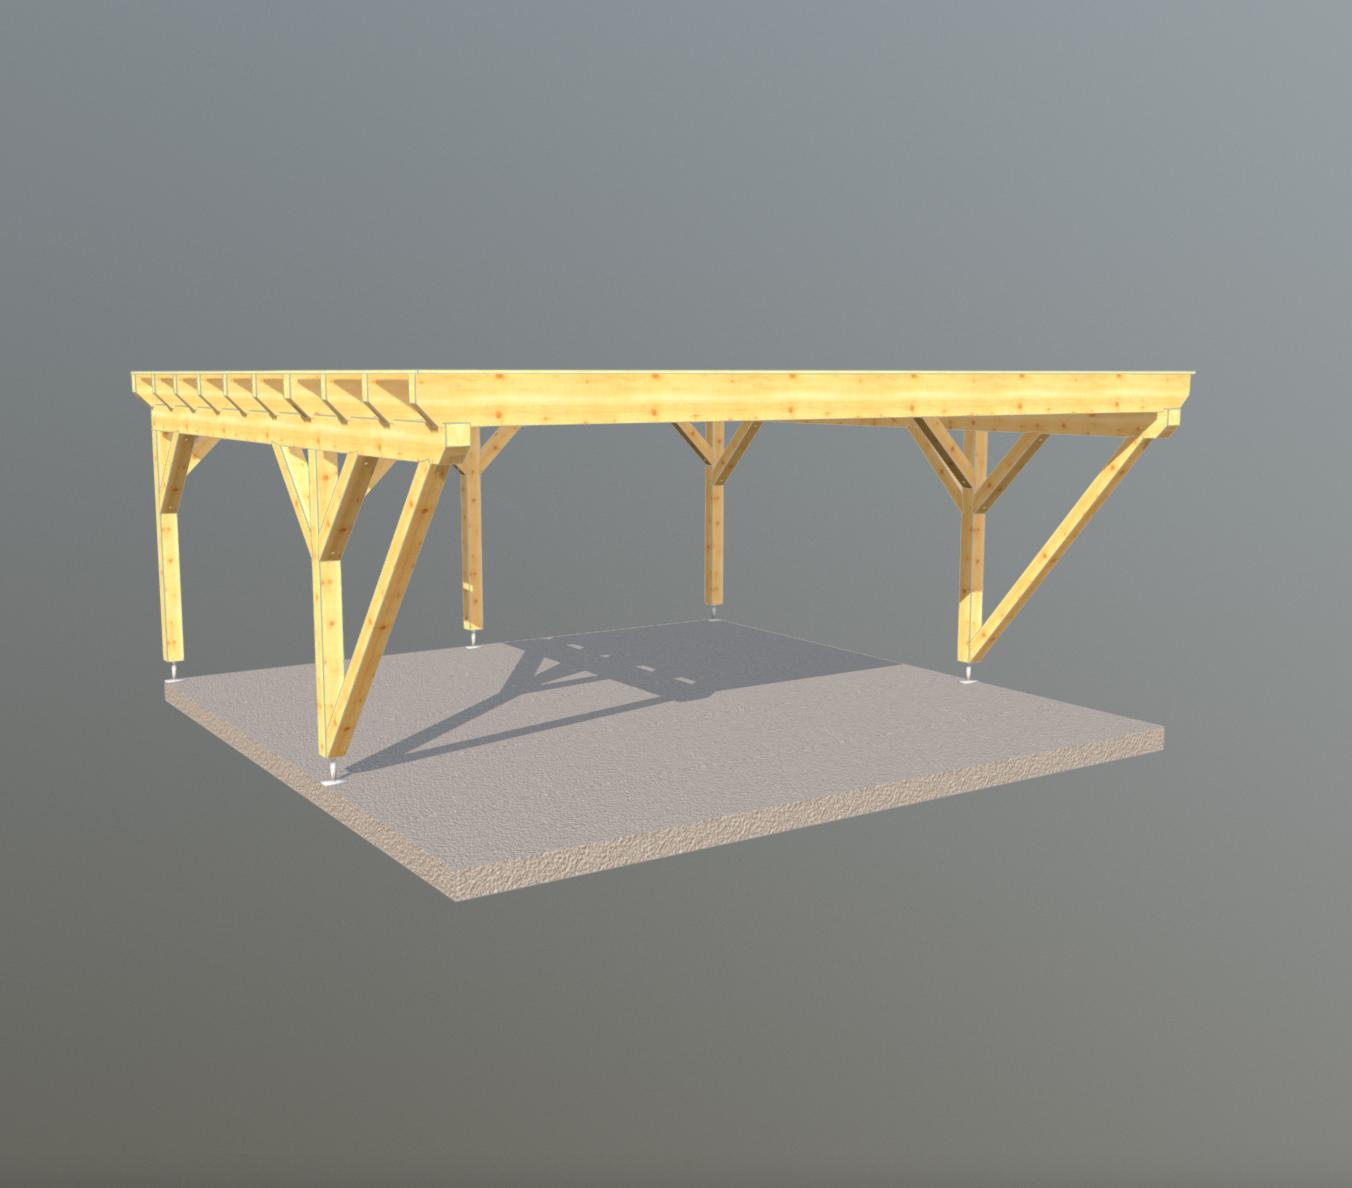 Holz Carport 6m x 6m flachdach, carports aus polen